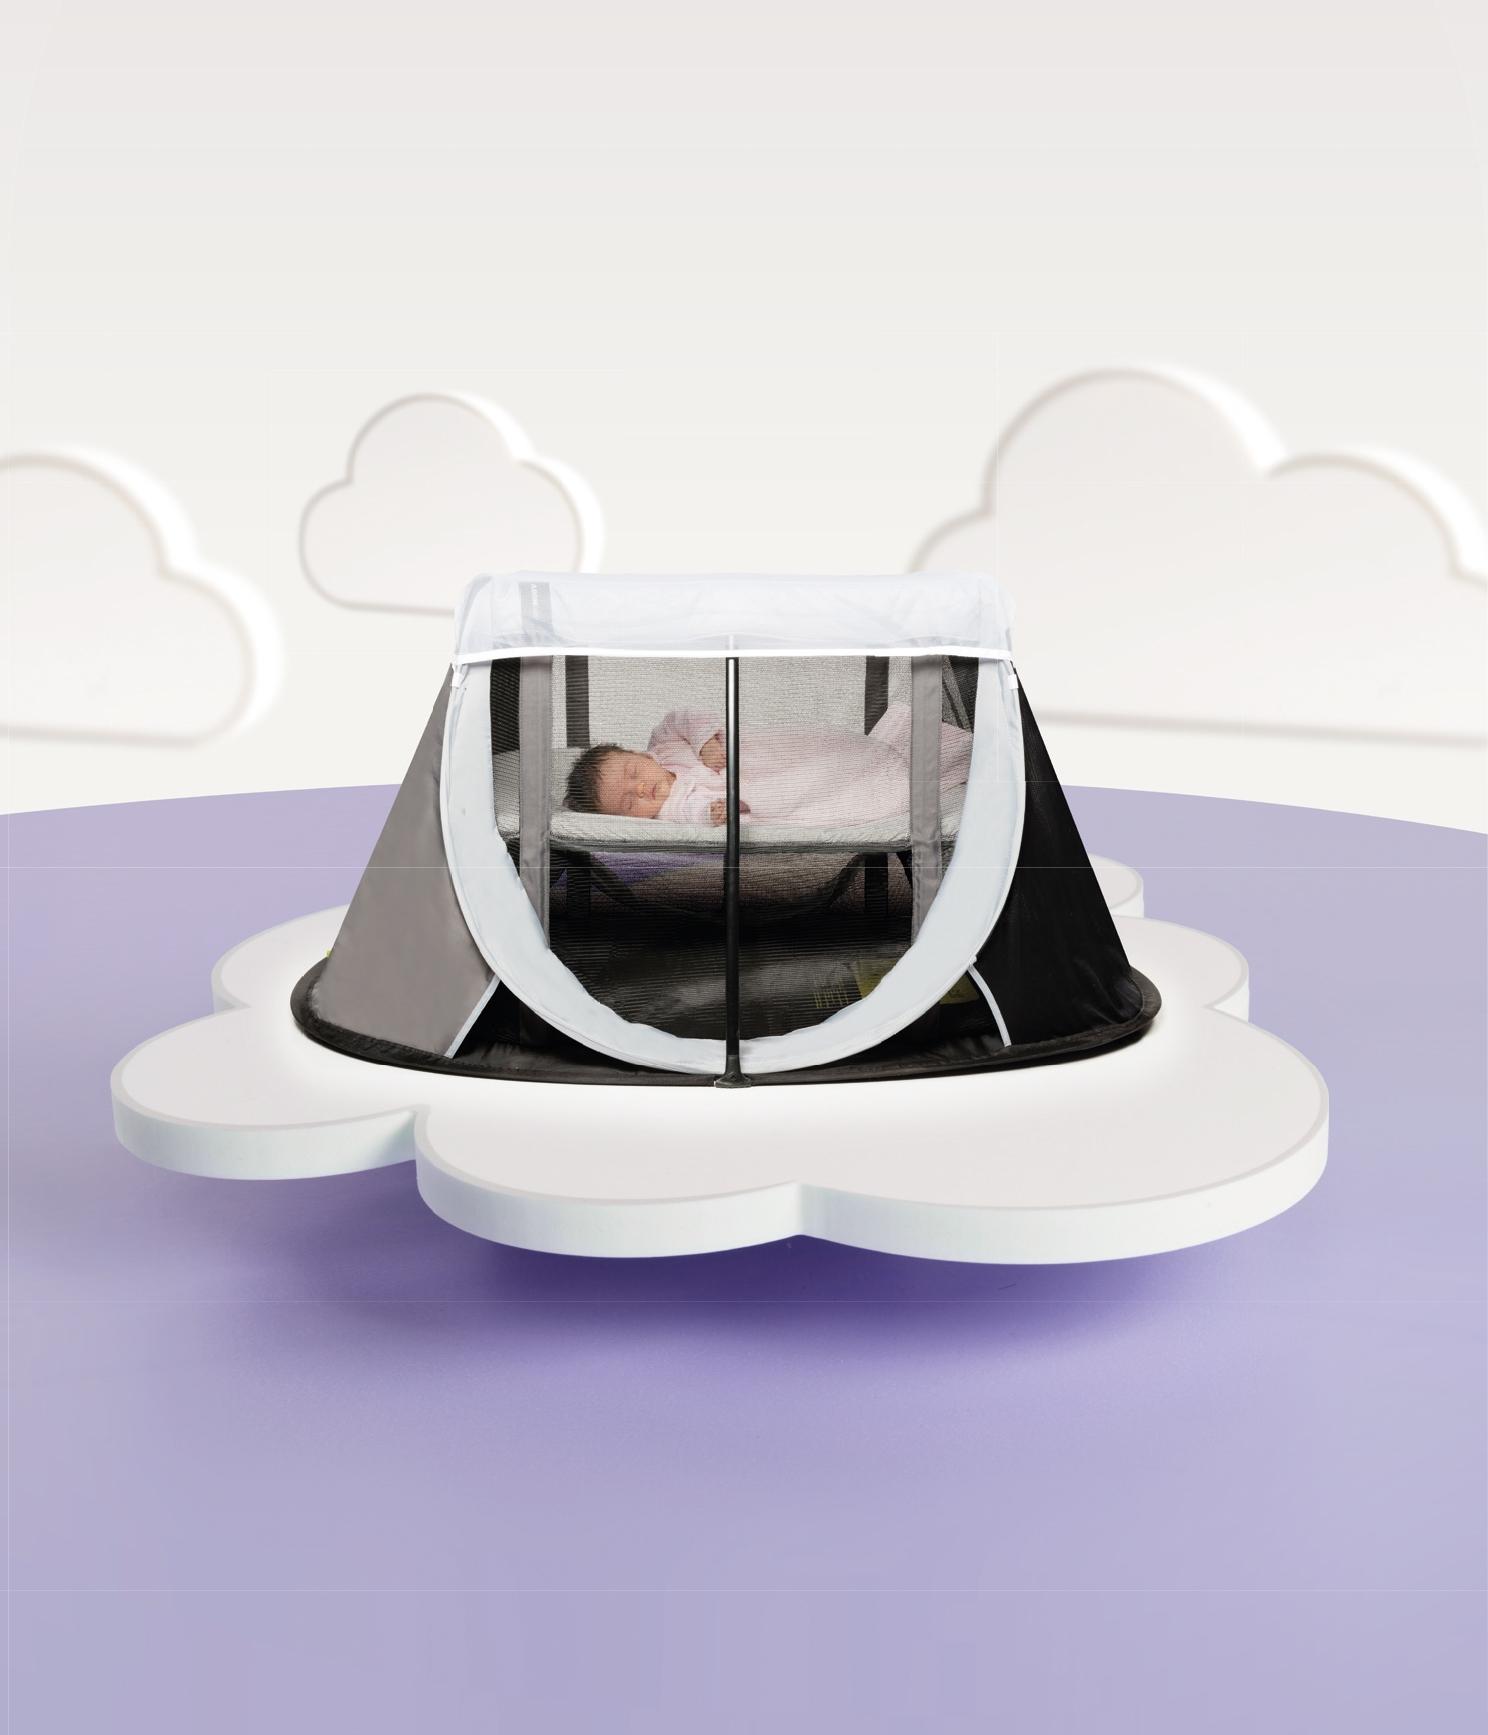 l_aeromoov-atc-mos-gr-child-clouds-background-1476191793